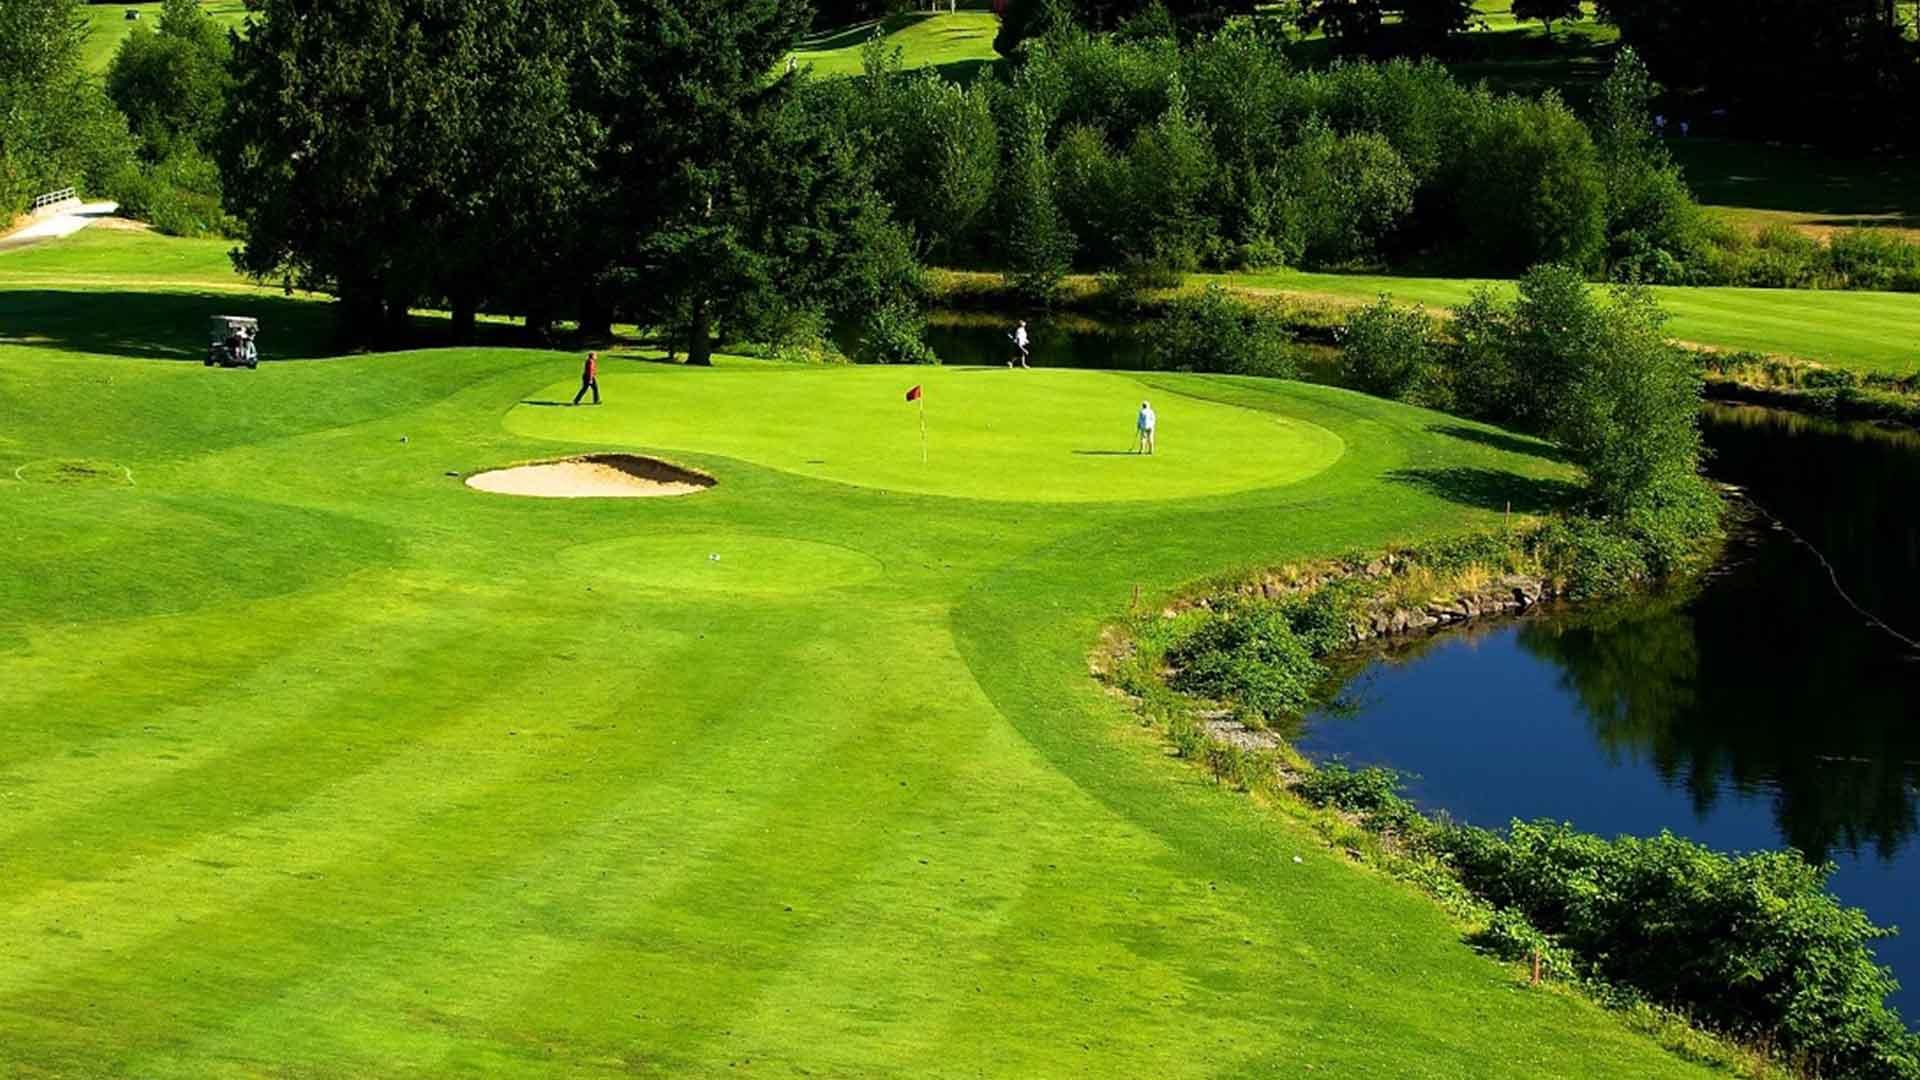 Jackson Park Golf Course Daily Deal Tee Times